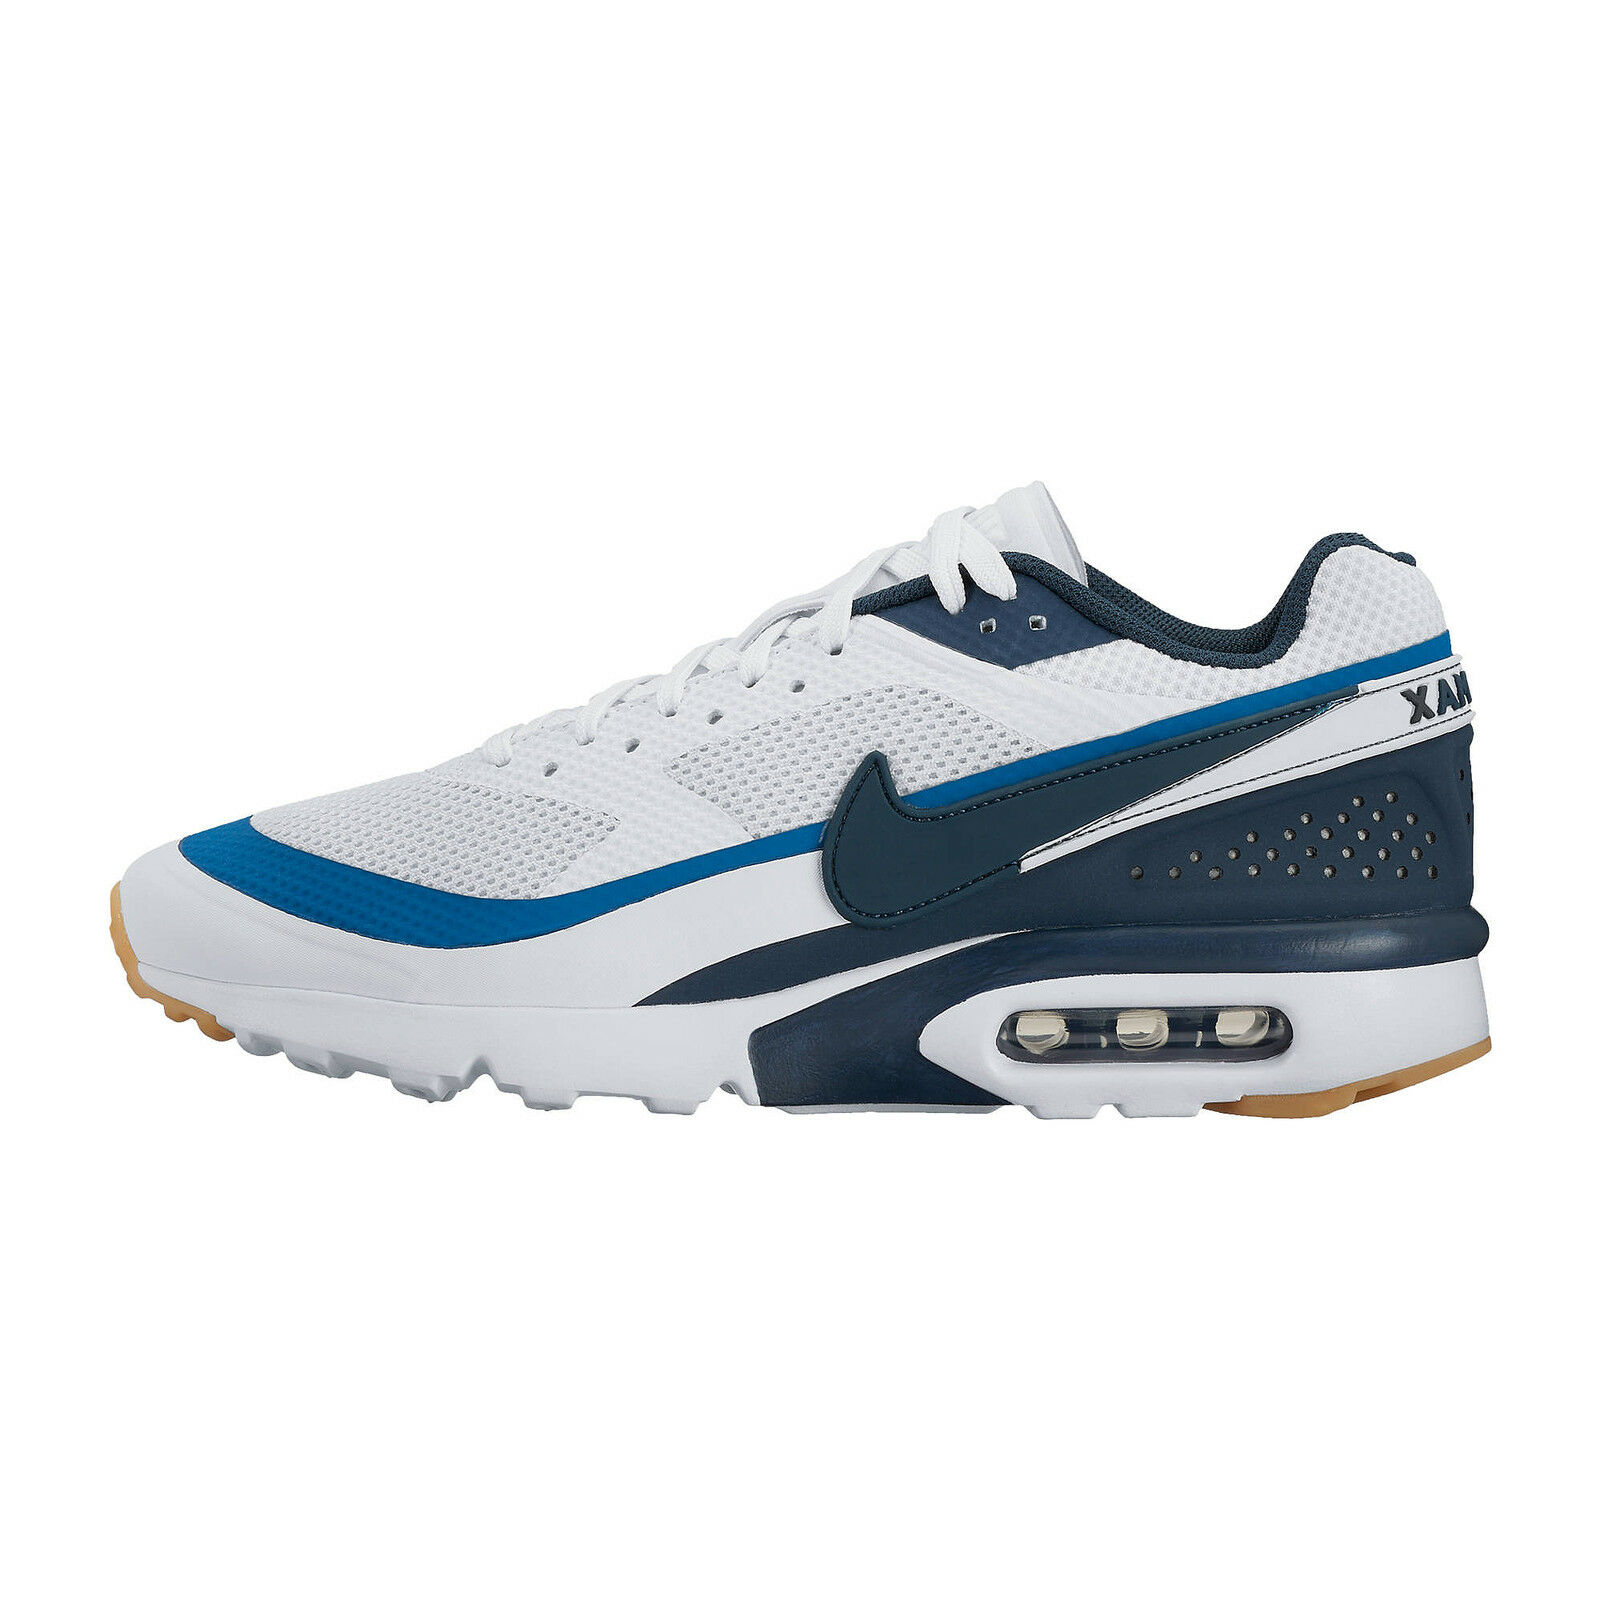 Nike Air Max BW Ultra 819475-100 Freizeitschuh Lifestyle